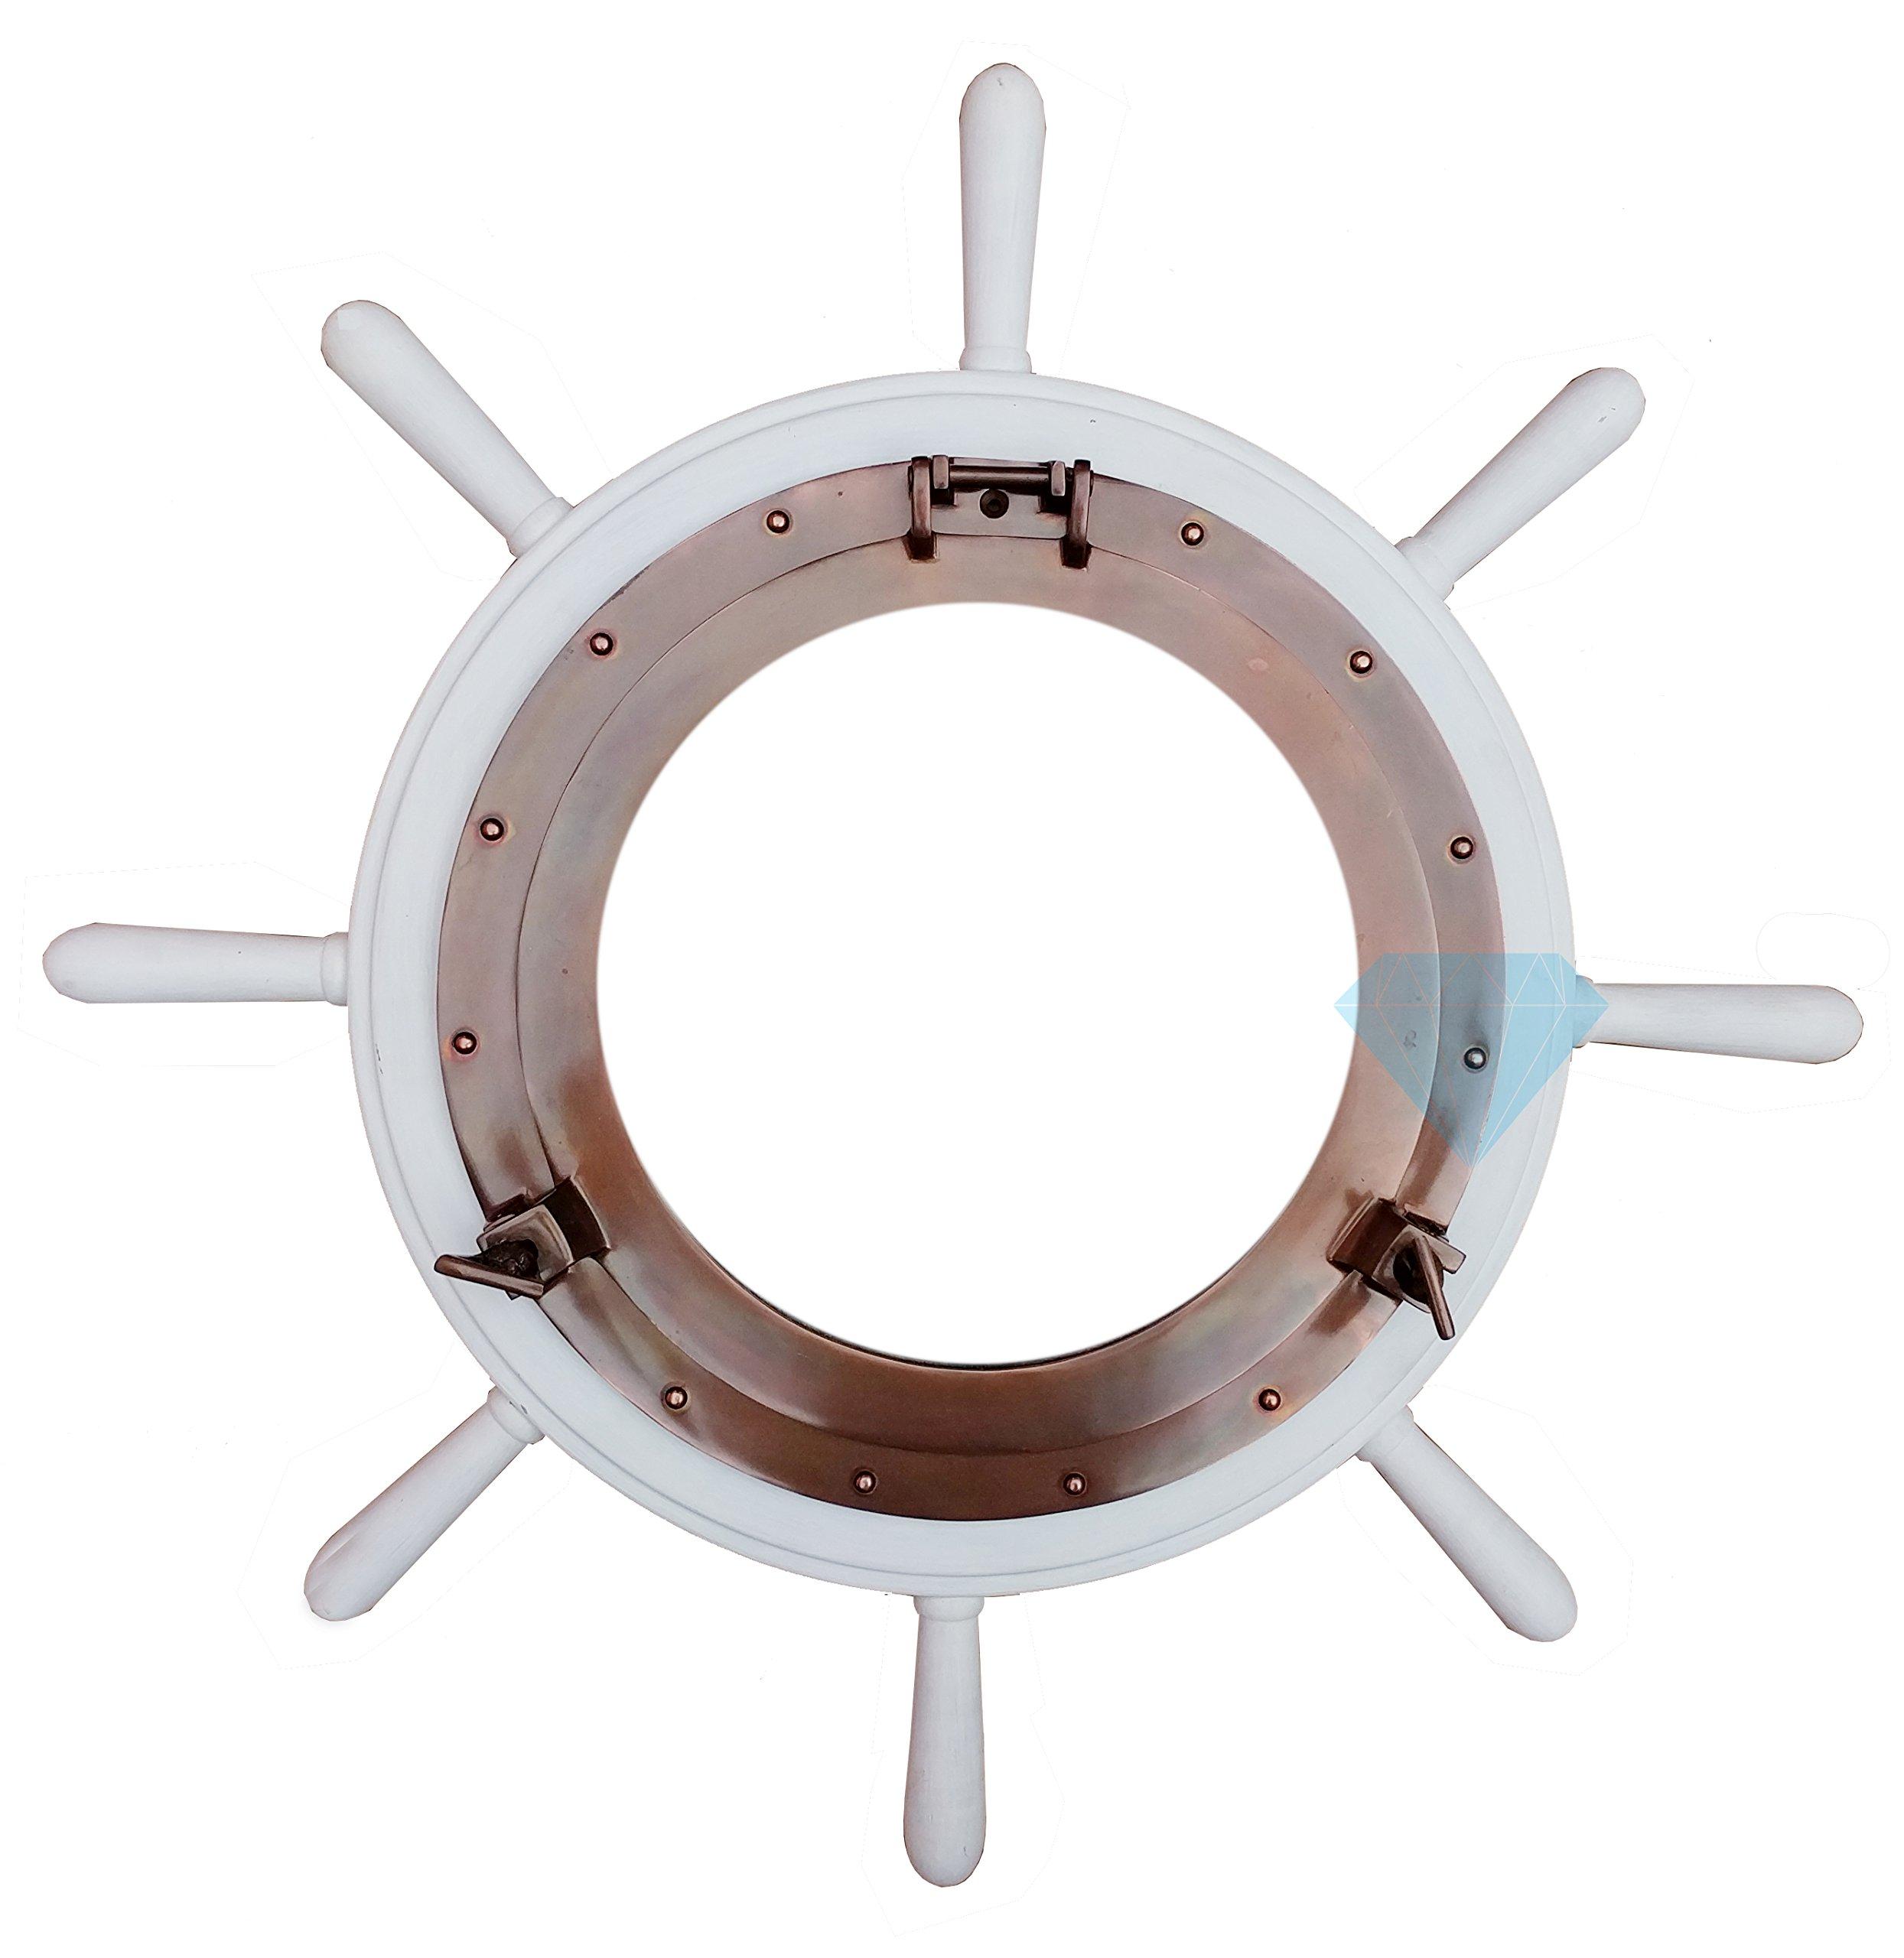 Classic White Nautical Ship Wheel With Antique Rustic Sparkling Porthole Mirror | Premium Home Decor | Maritime Ocean House Gift | Nagina International (42 Inches)